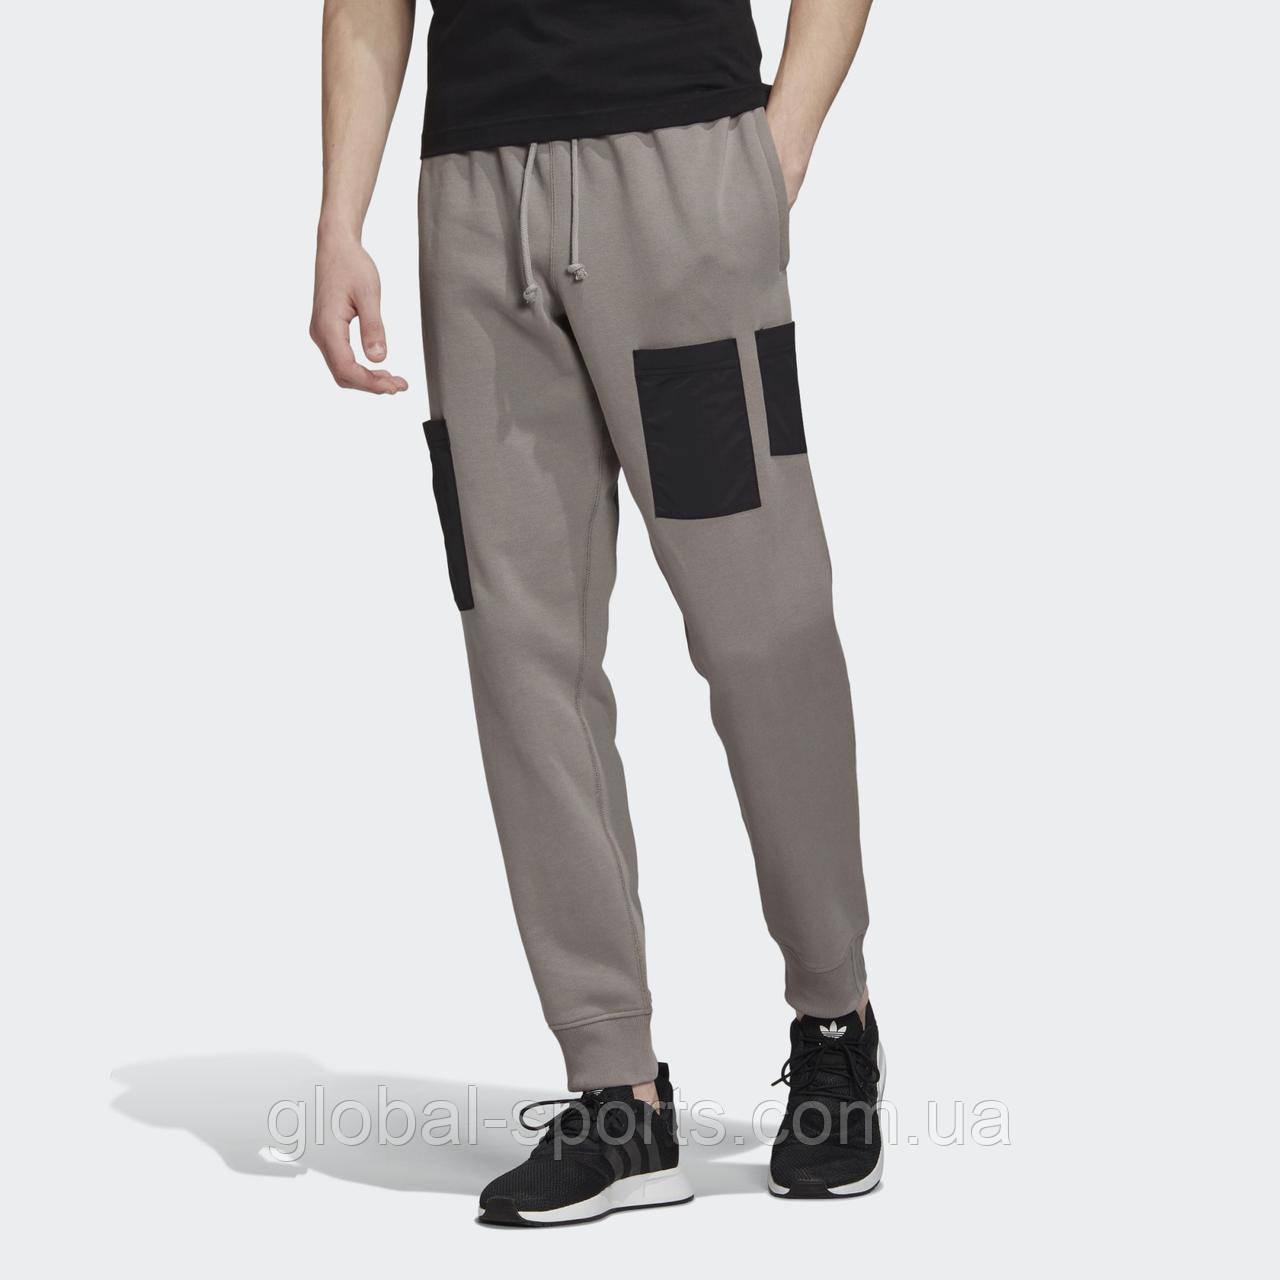 Чоловічі штани-джоггеры Adidas Originals R. Y. V.(Артикул:FM2239)